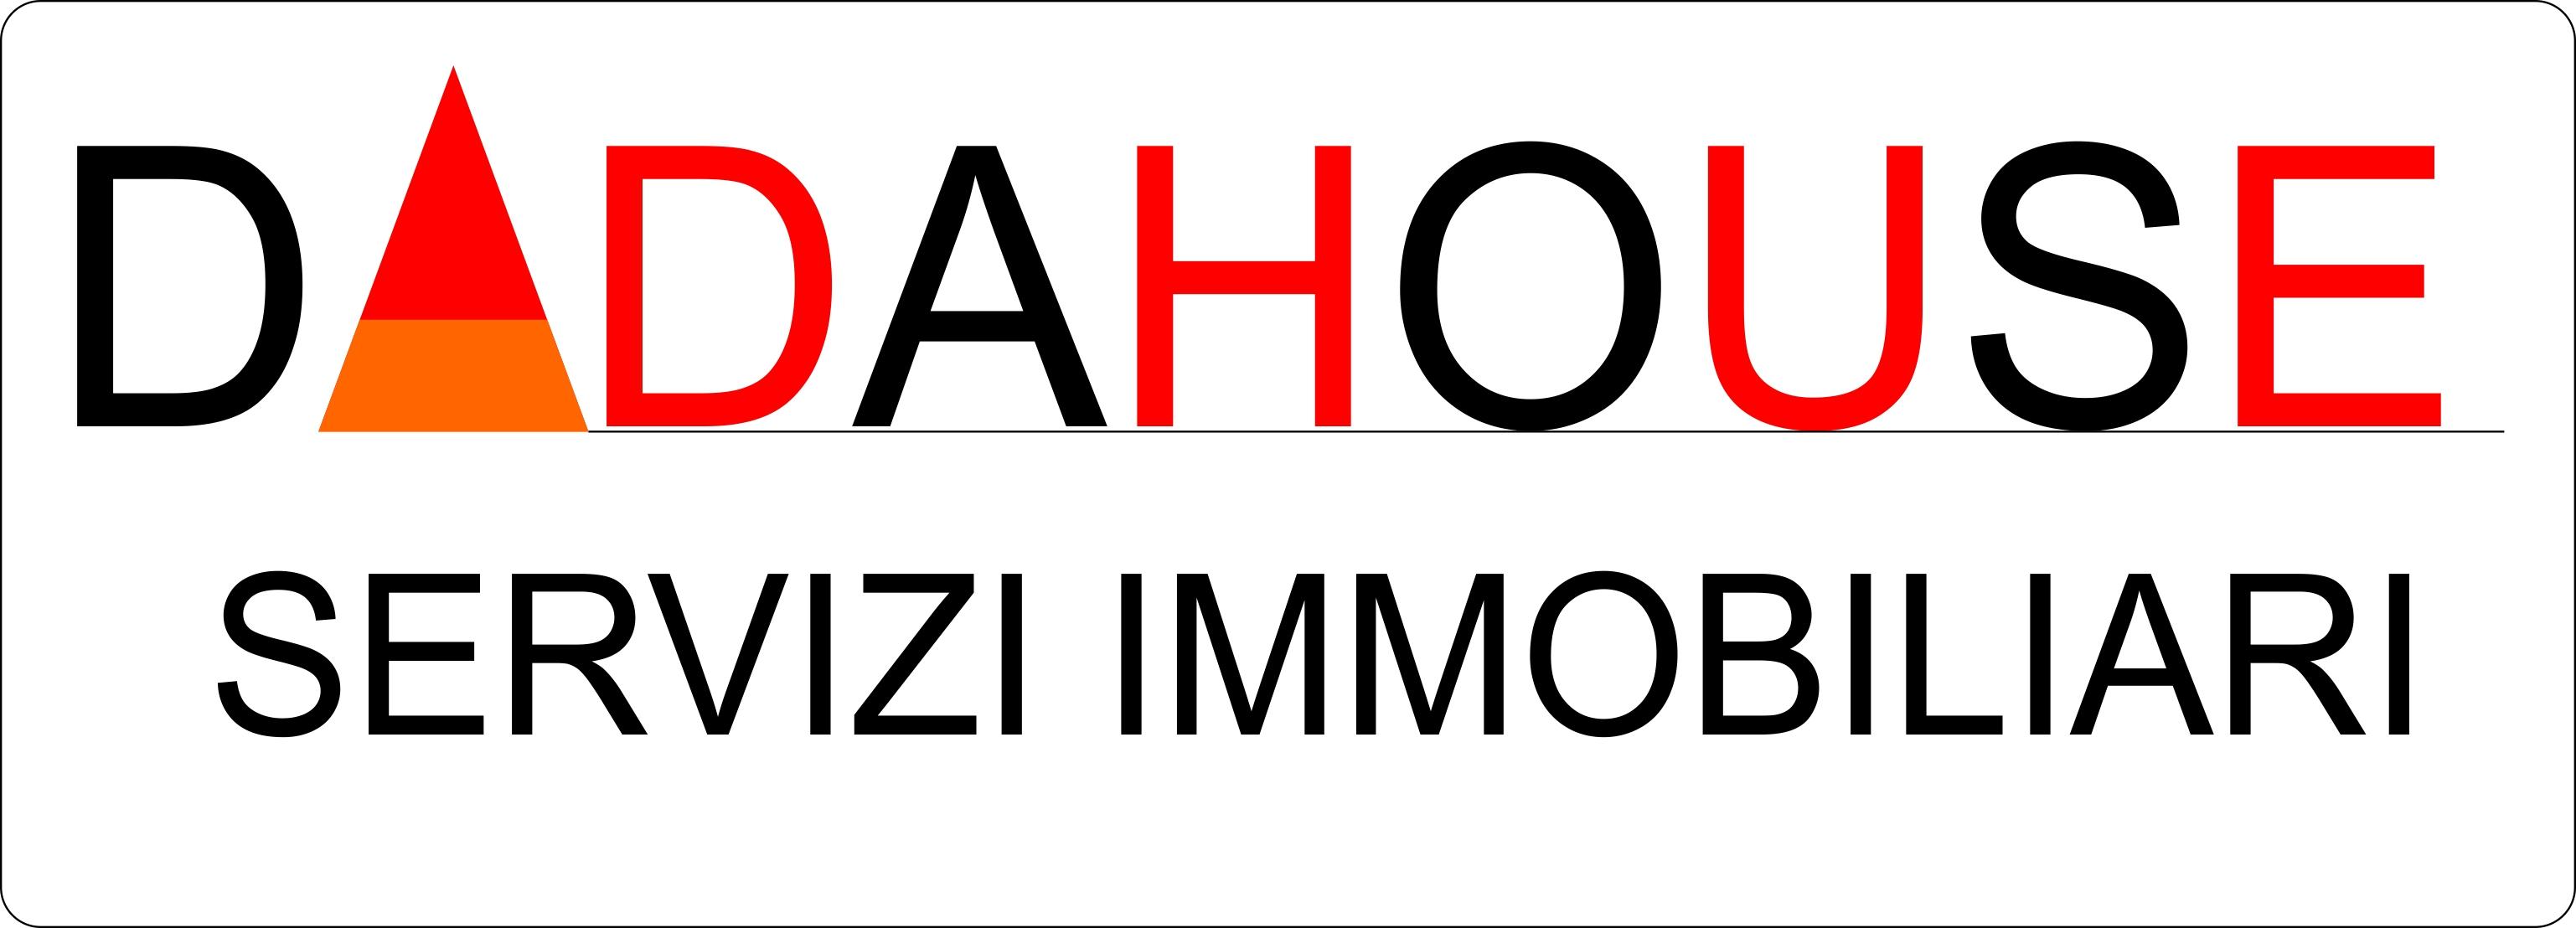 logo DADAHOUSE Immobiliare